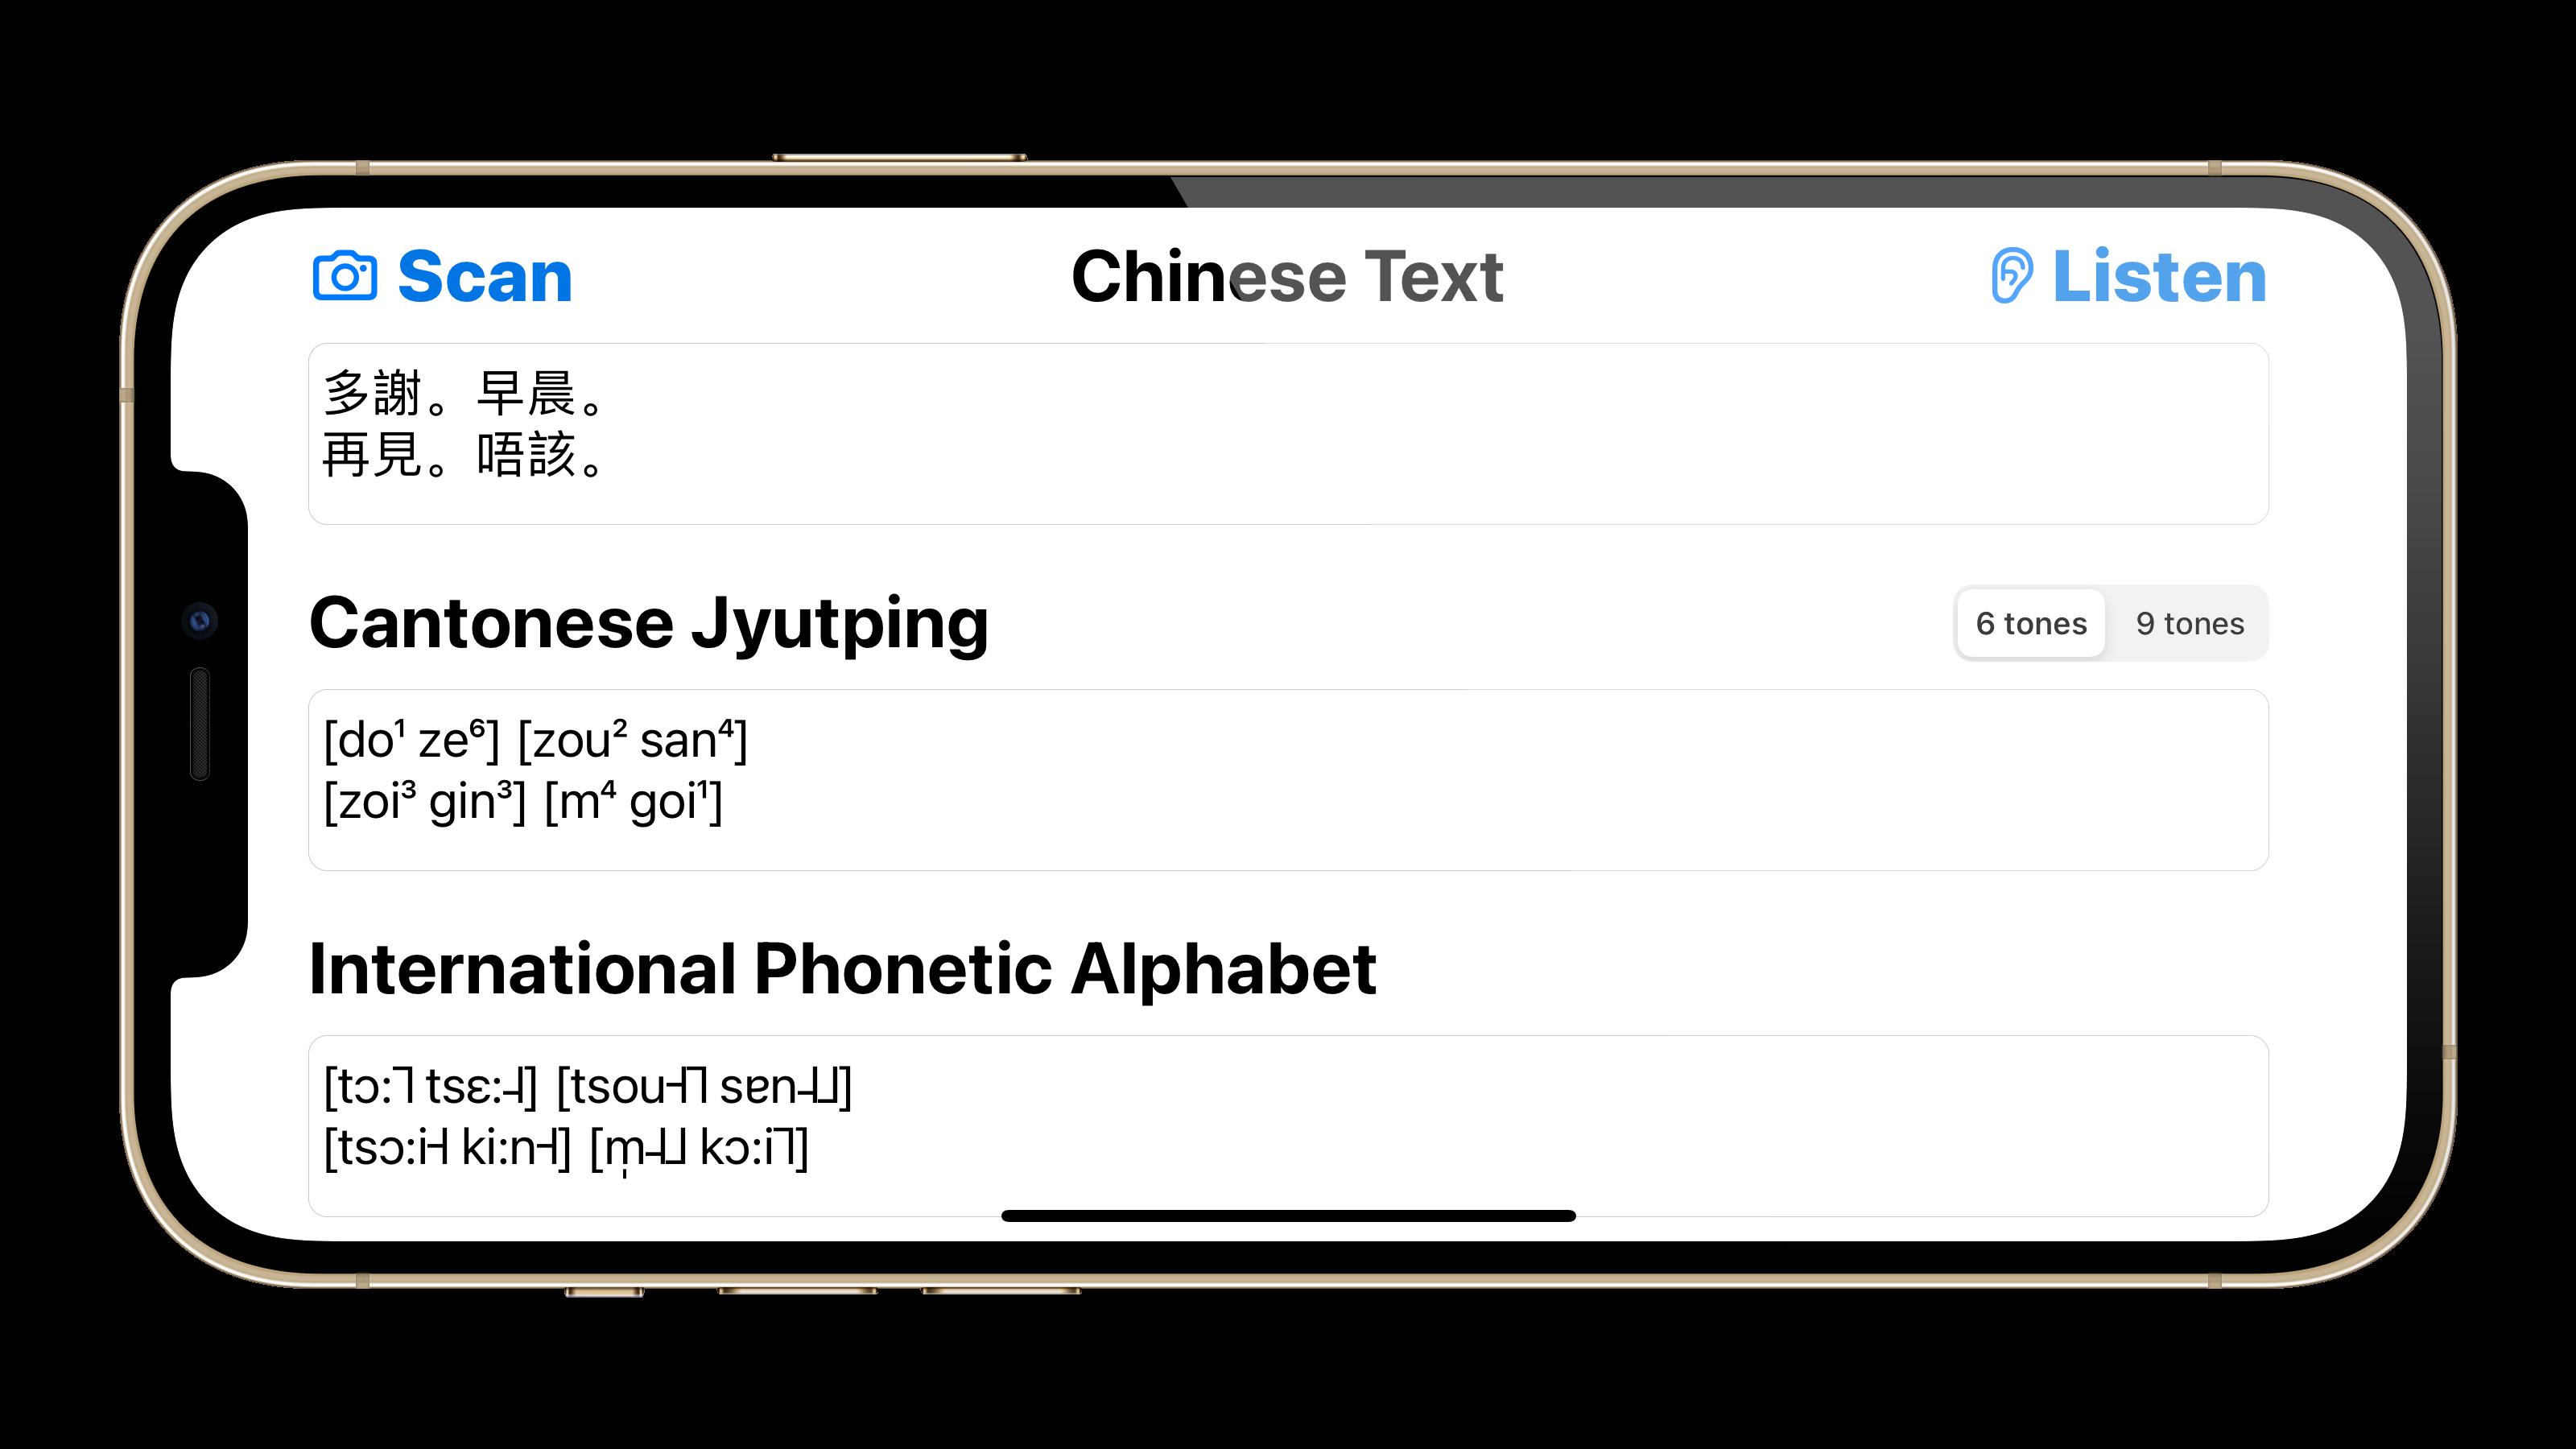 Cantonese Jyutping & IPA